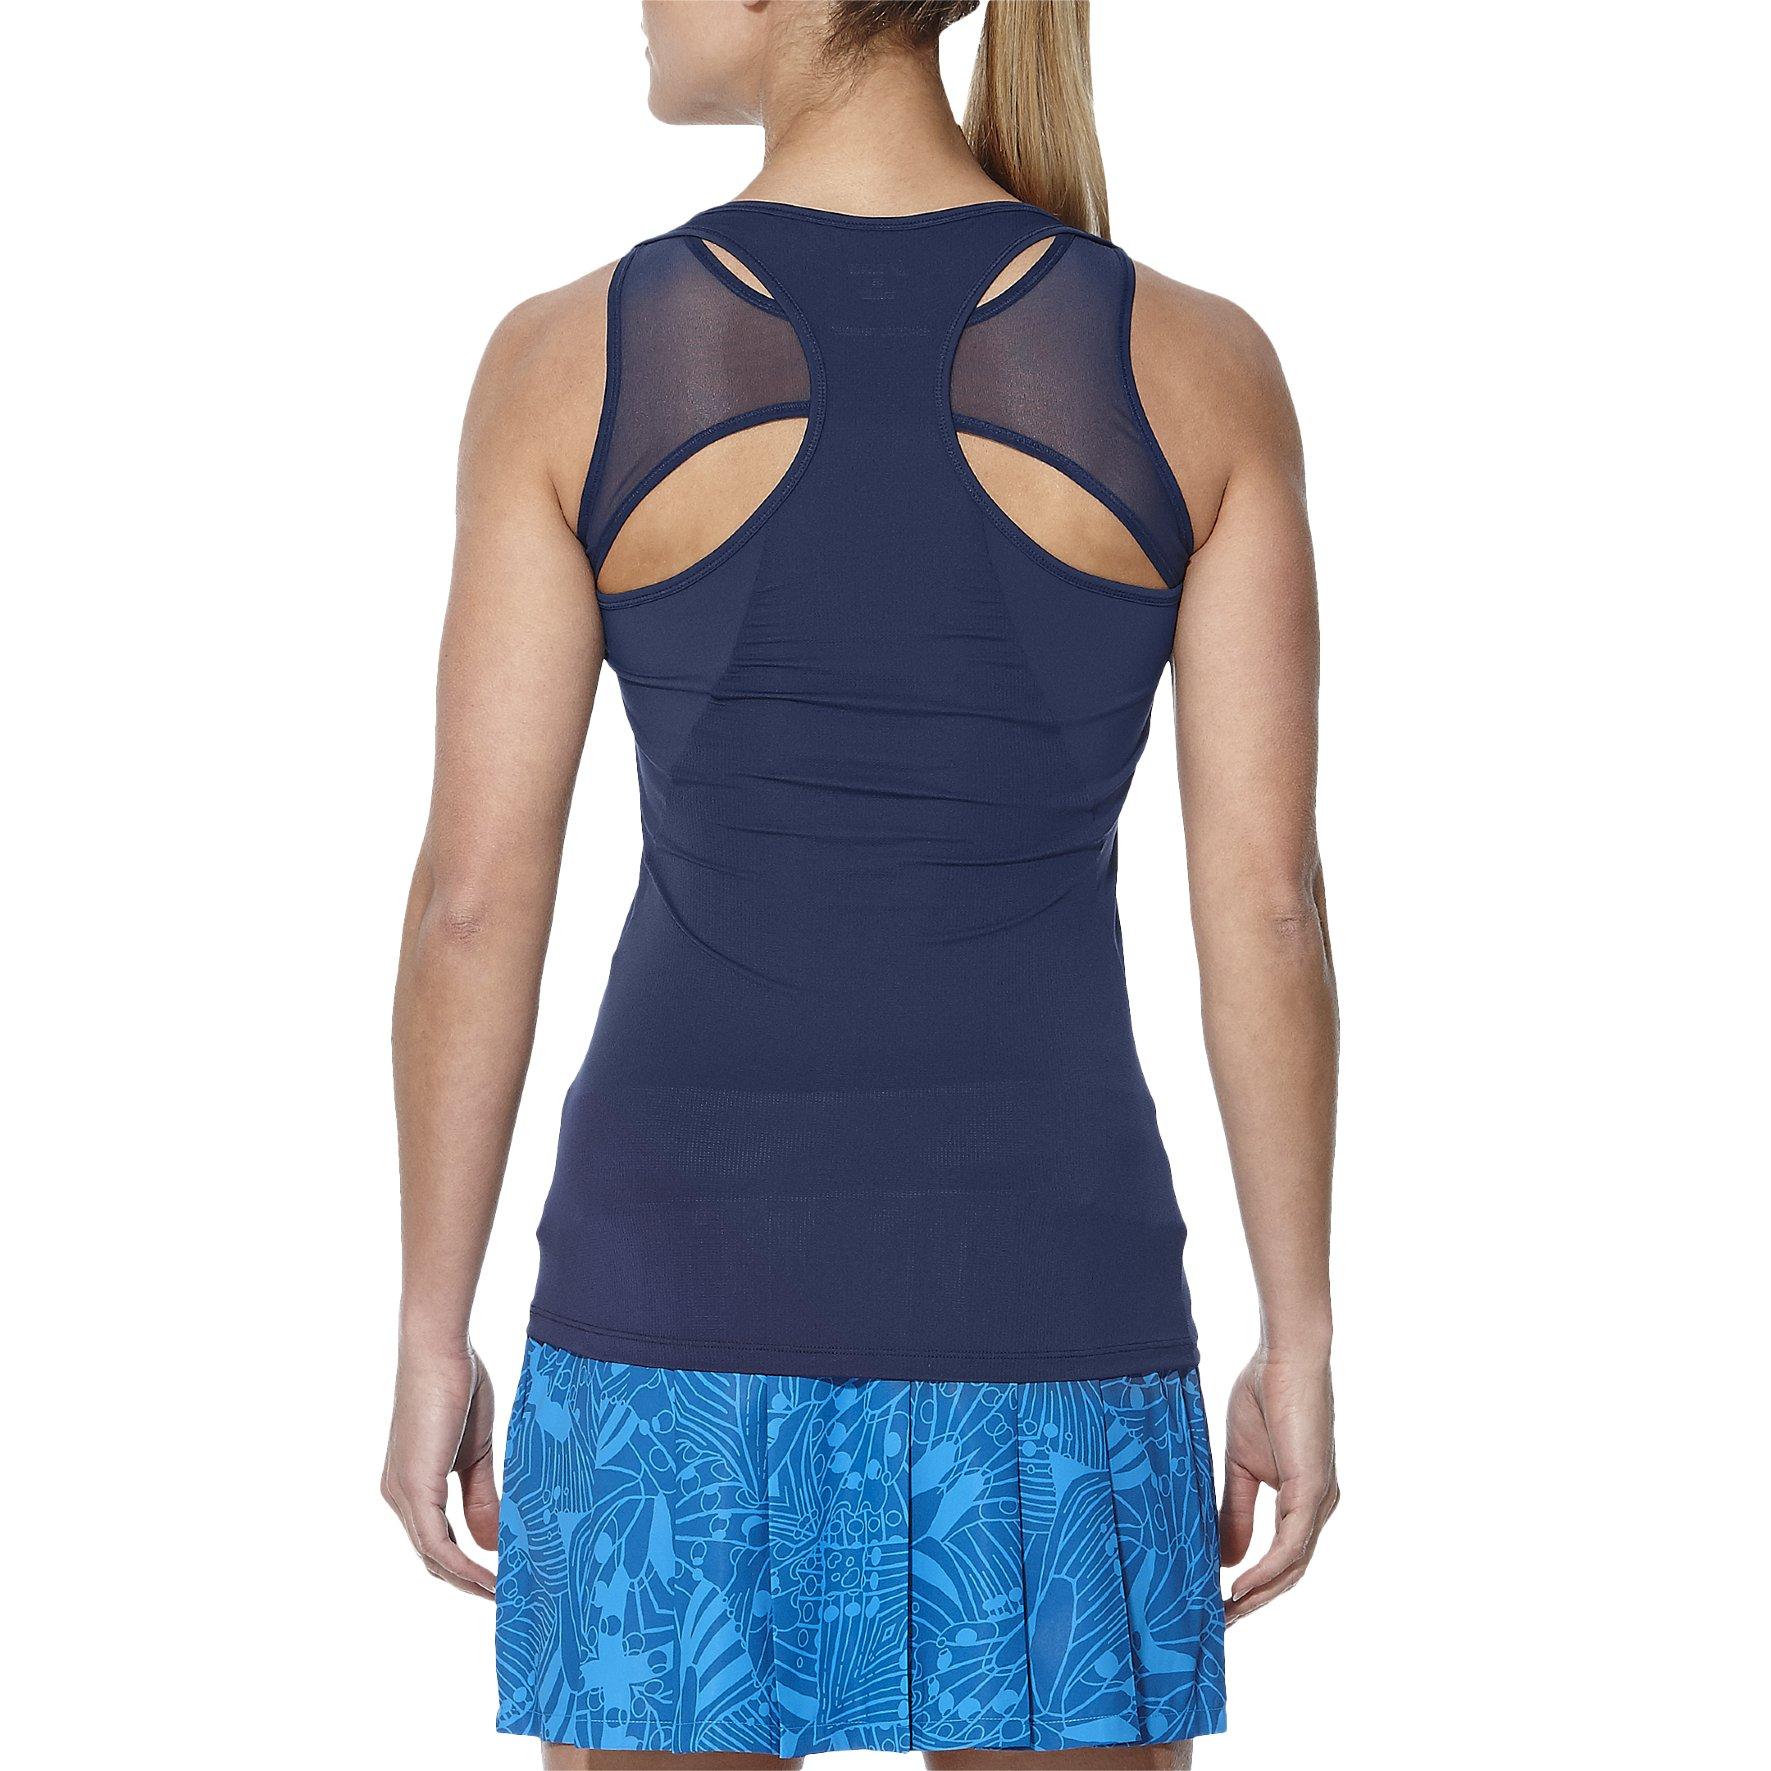 Asics Athlete Ladies Tennis Tank Top